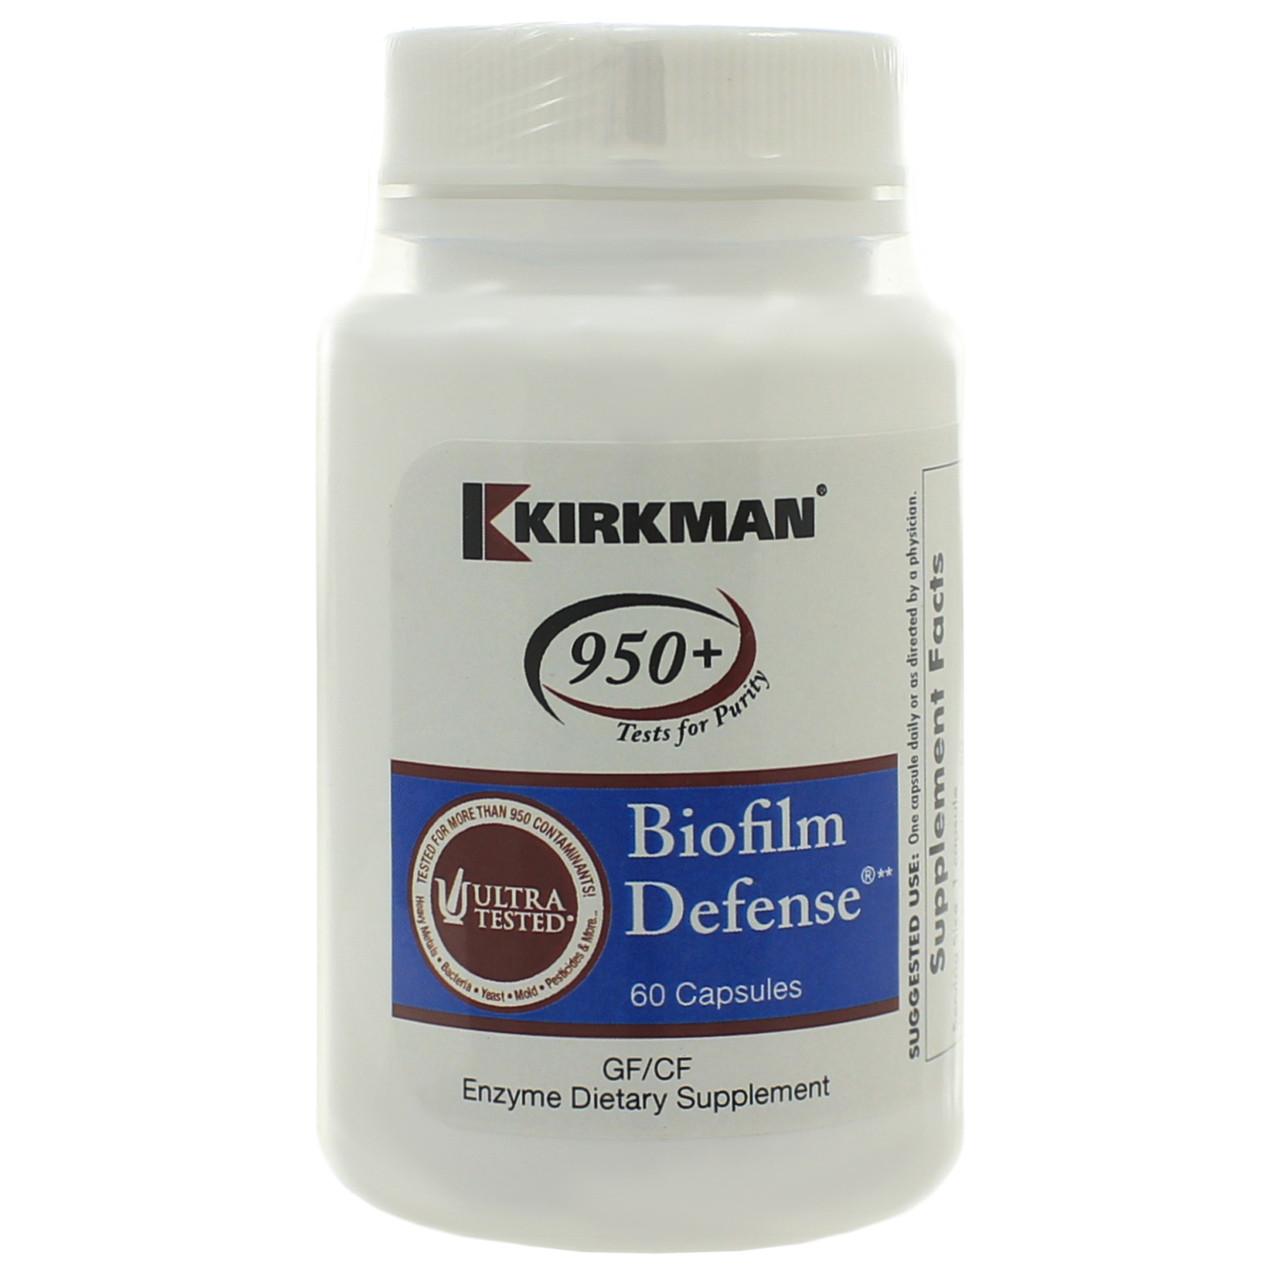 Kirkman Biofilm Defense